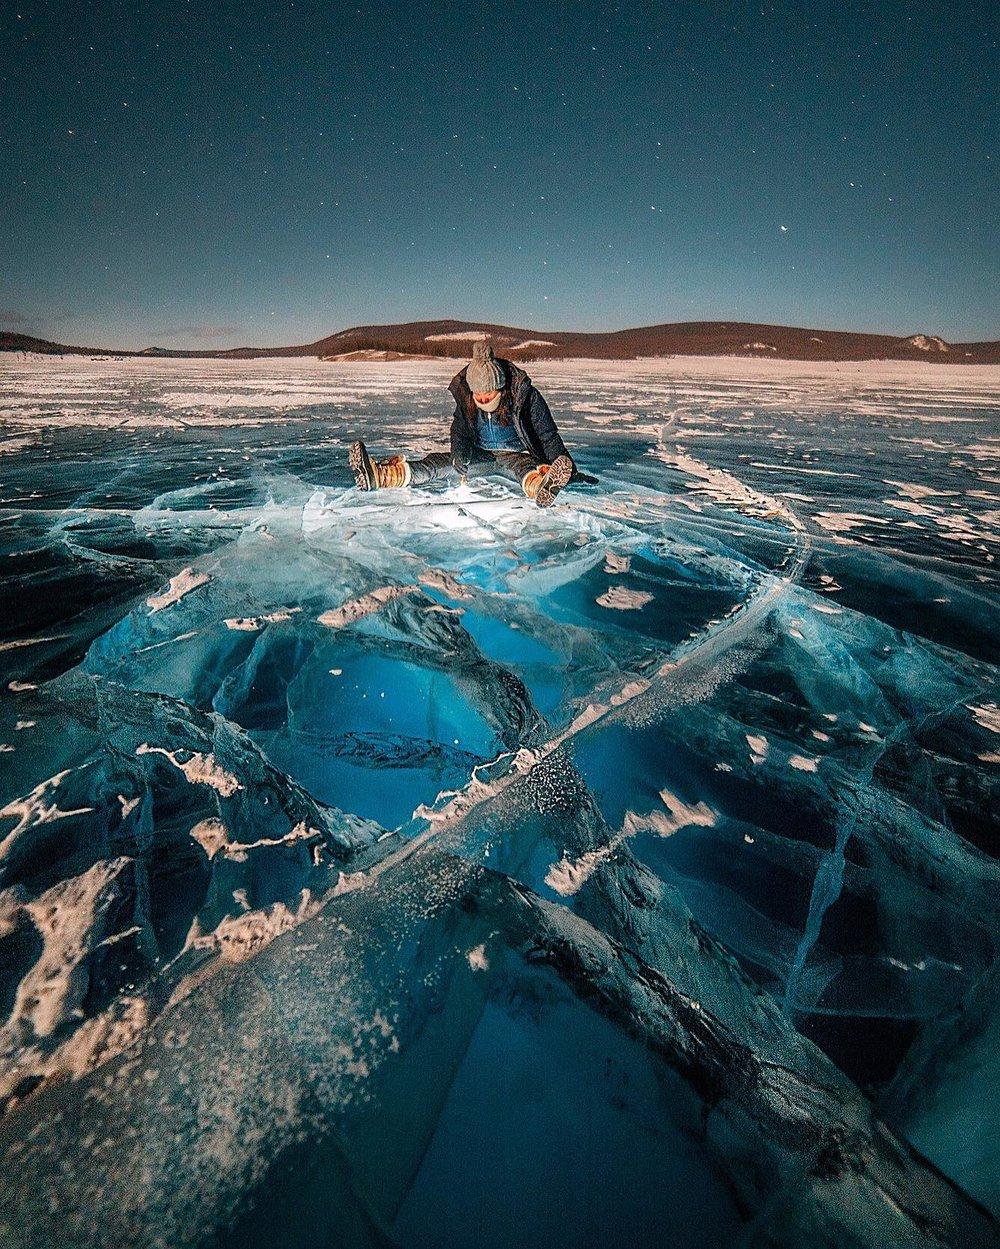 Tushig Mongolian Photographer